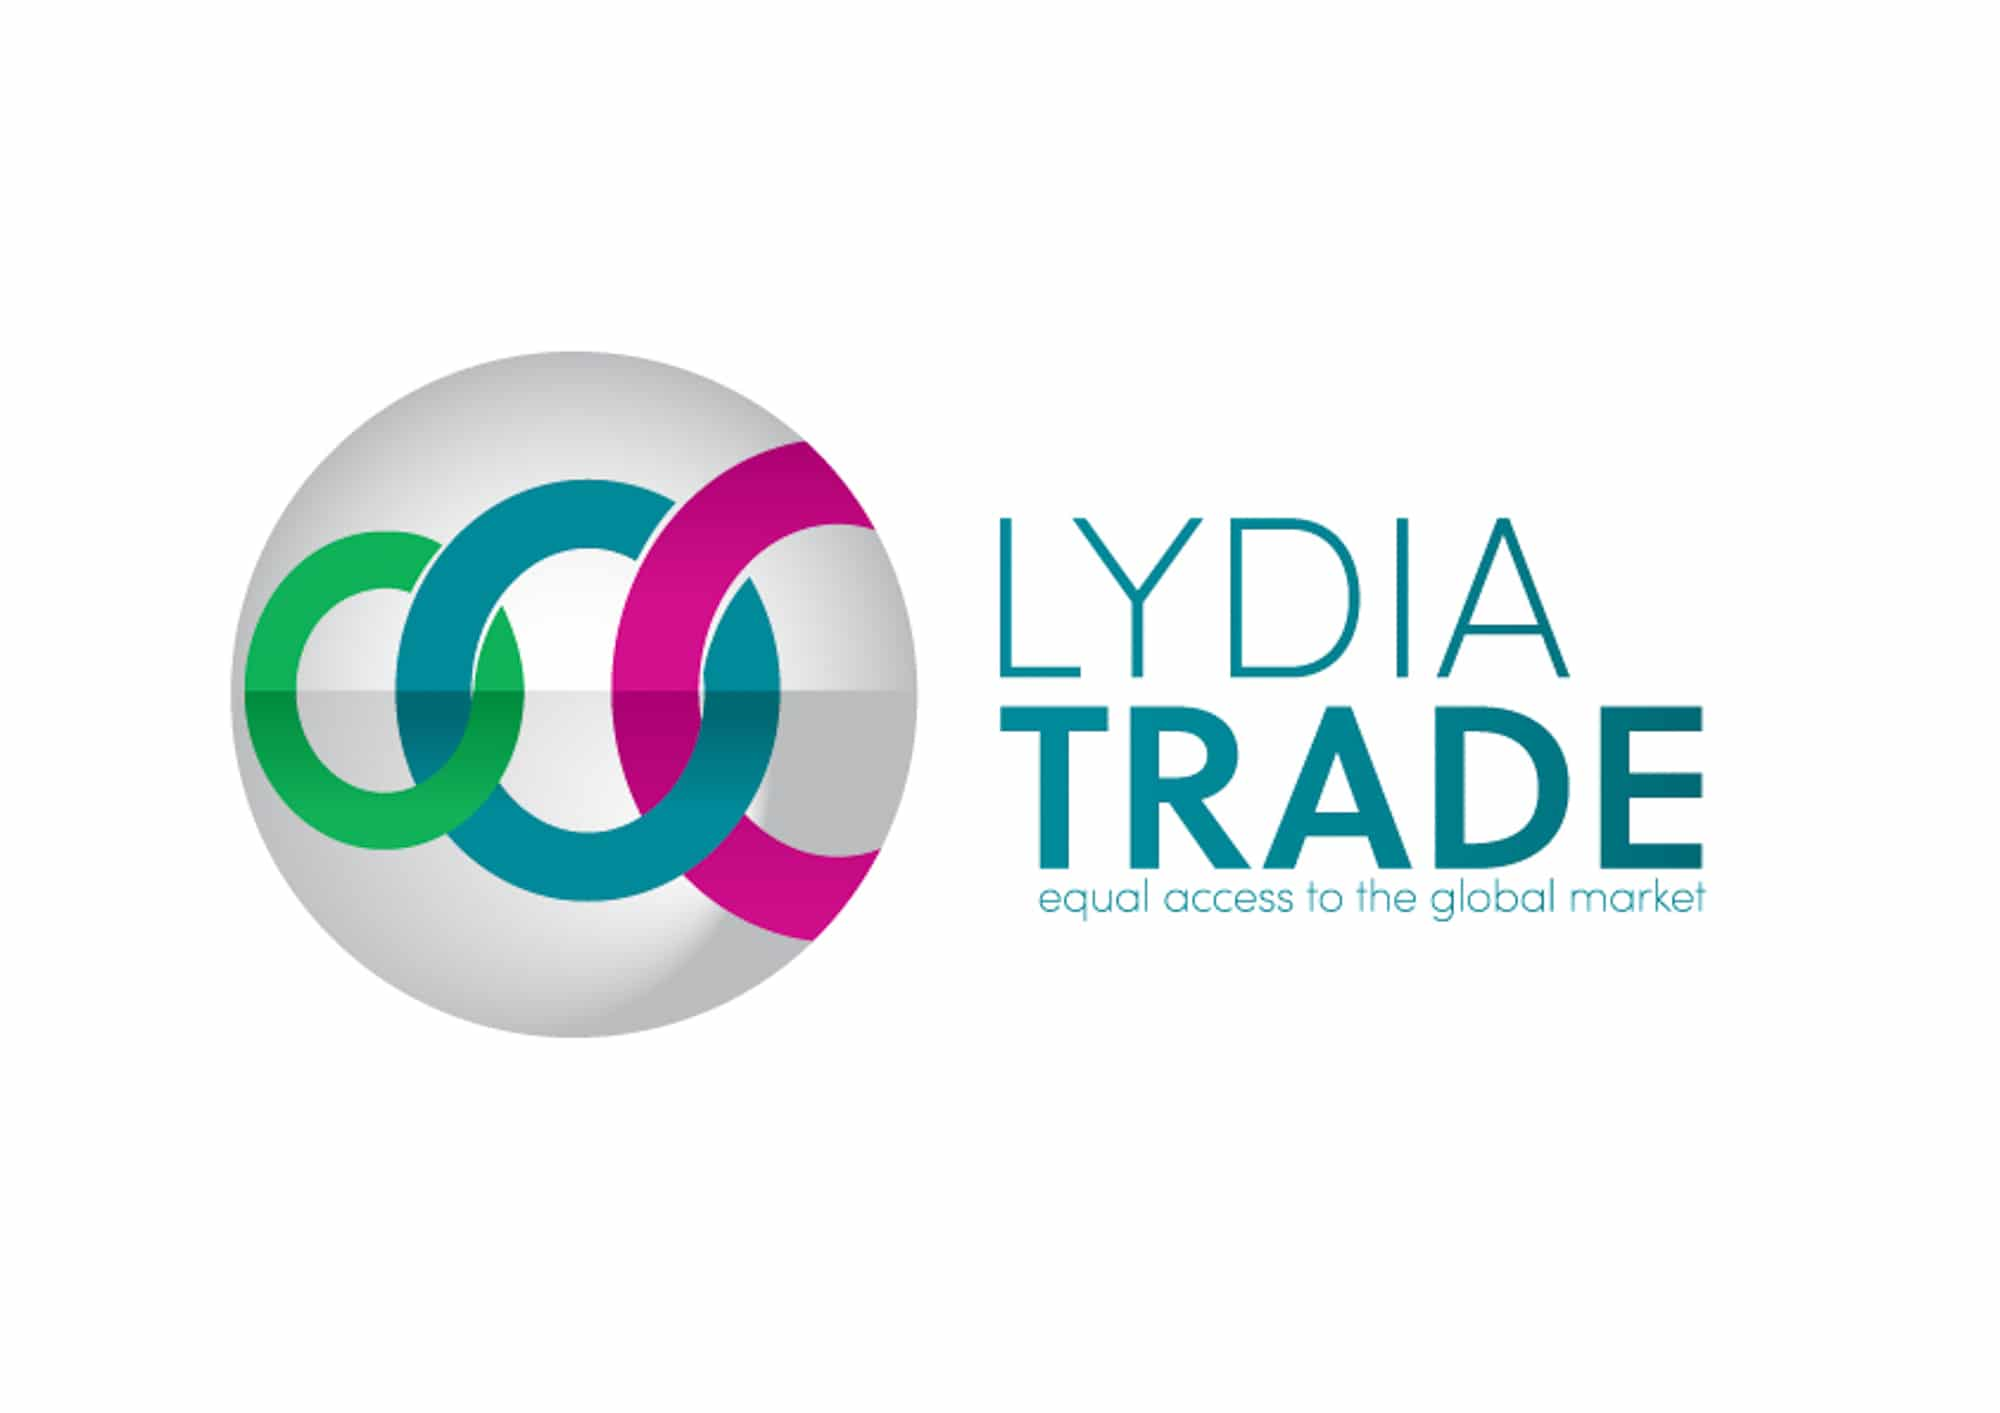 Het logo van Lydia Trade in kleur